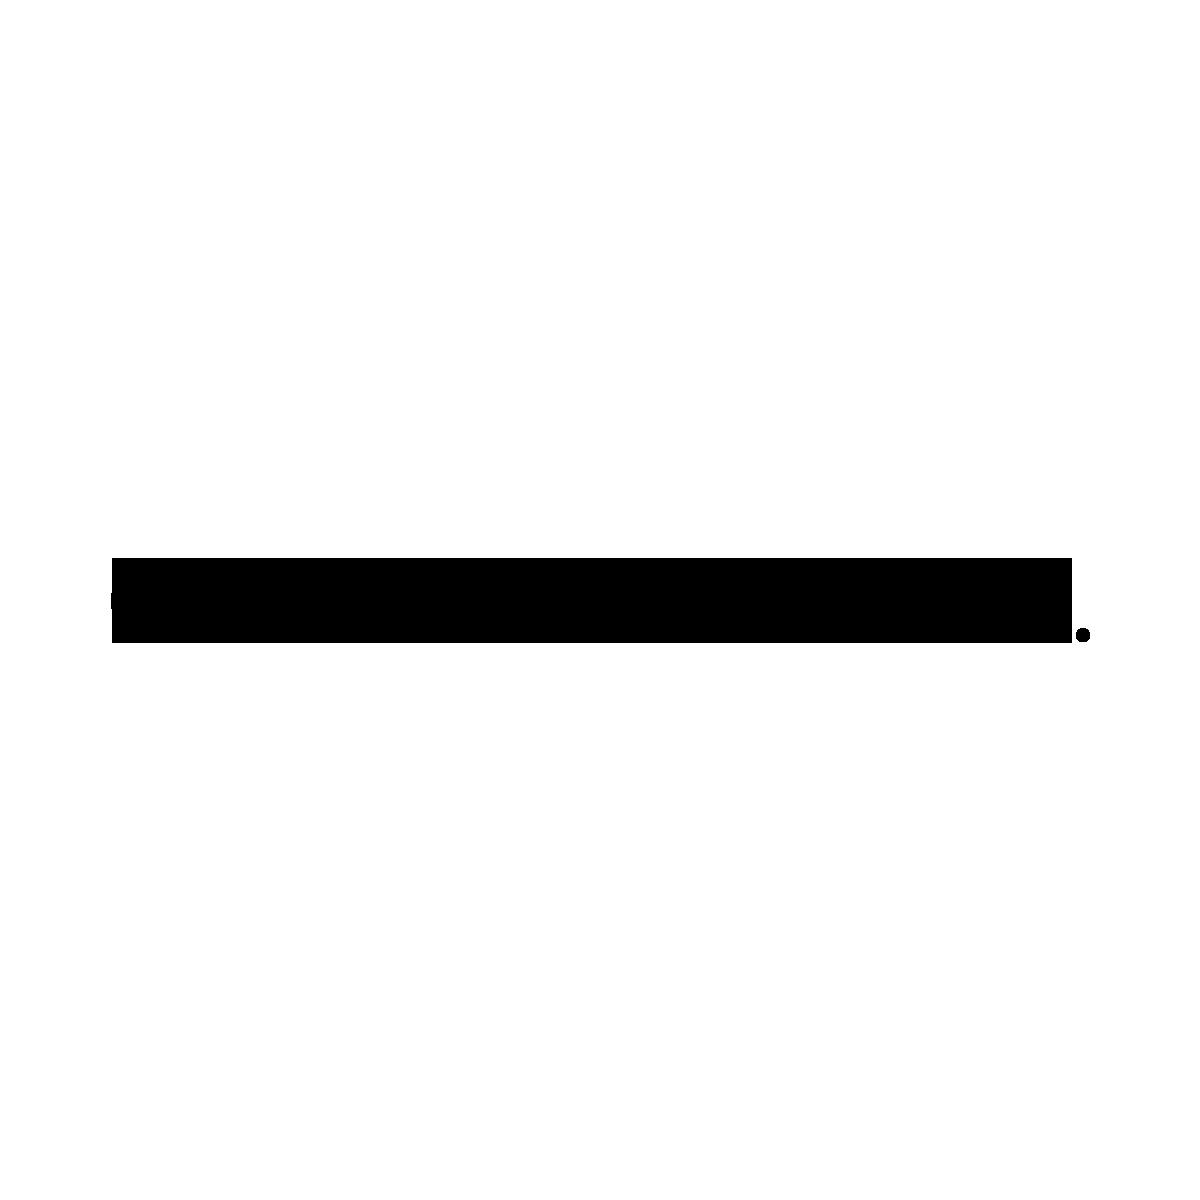 Ankle-boot-waxed-nubuck-dark-brown